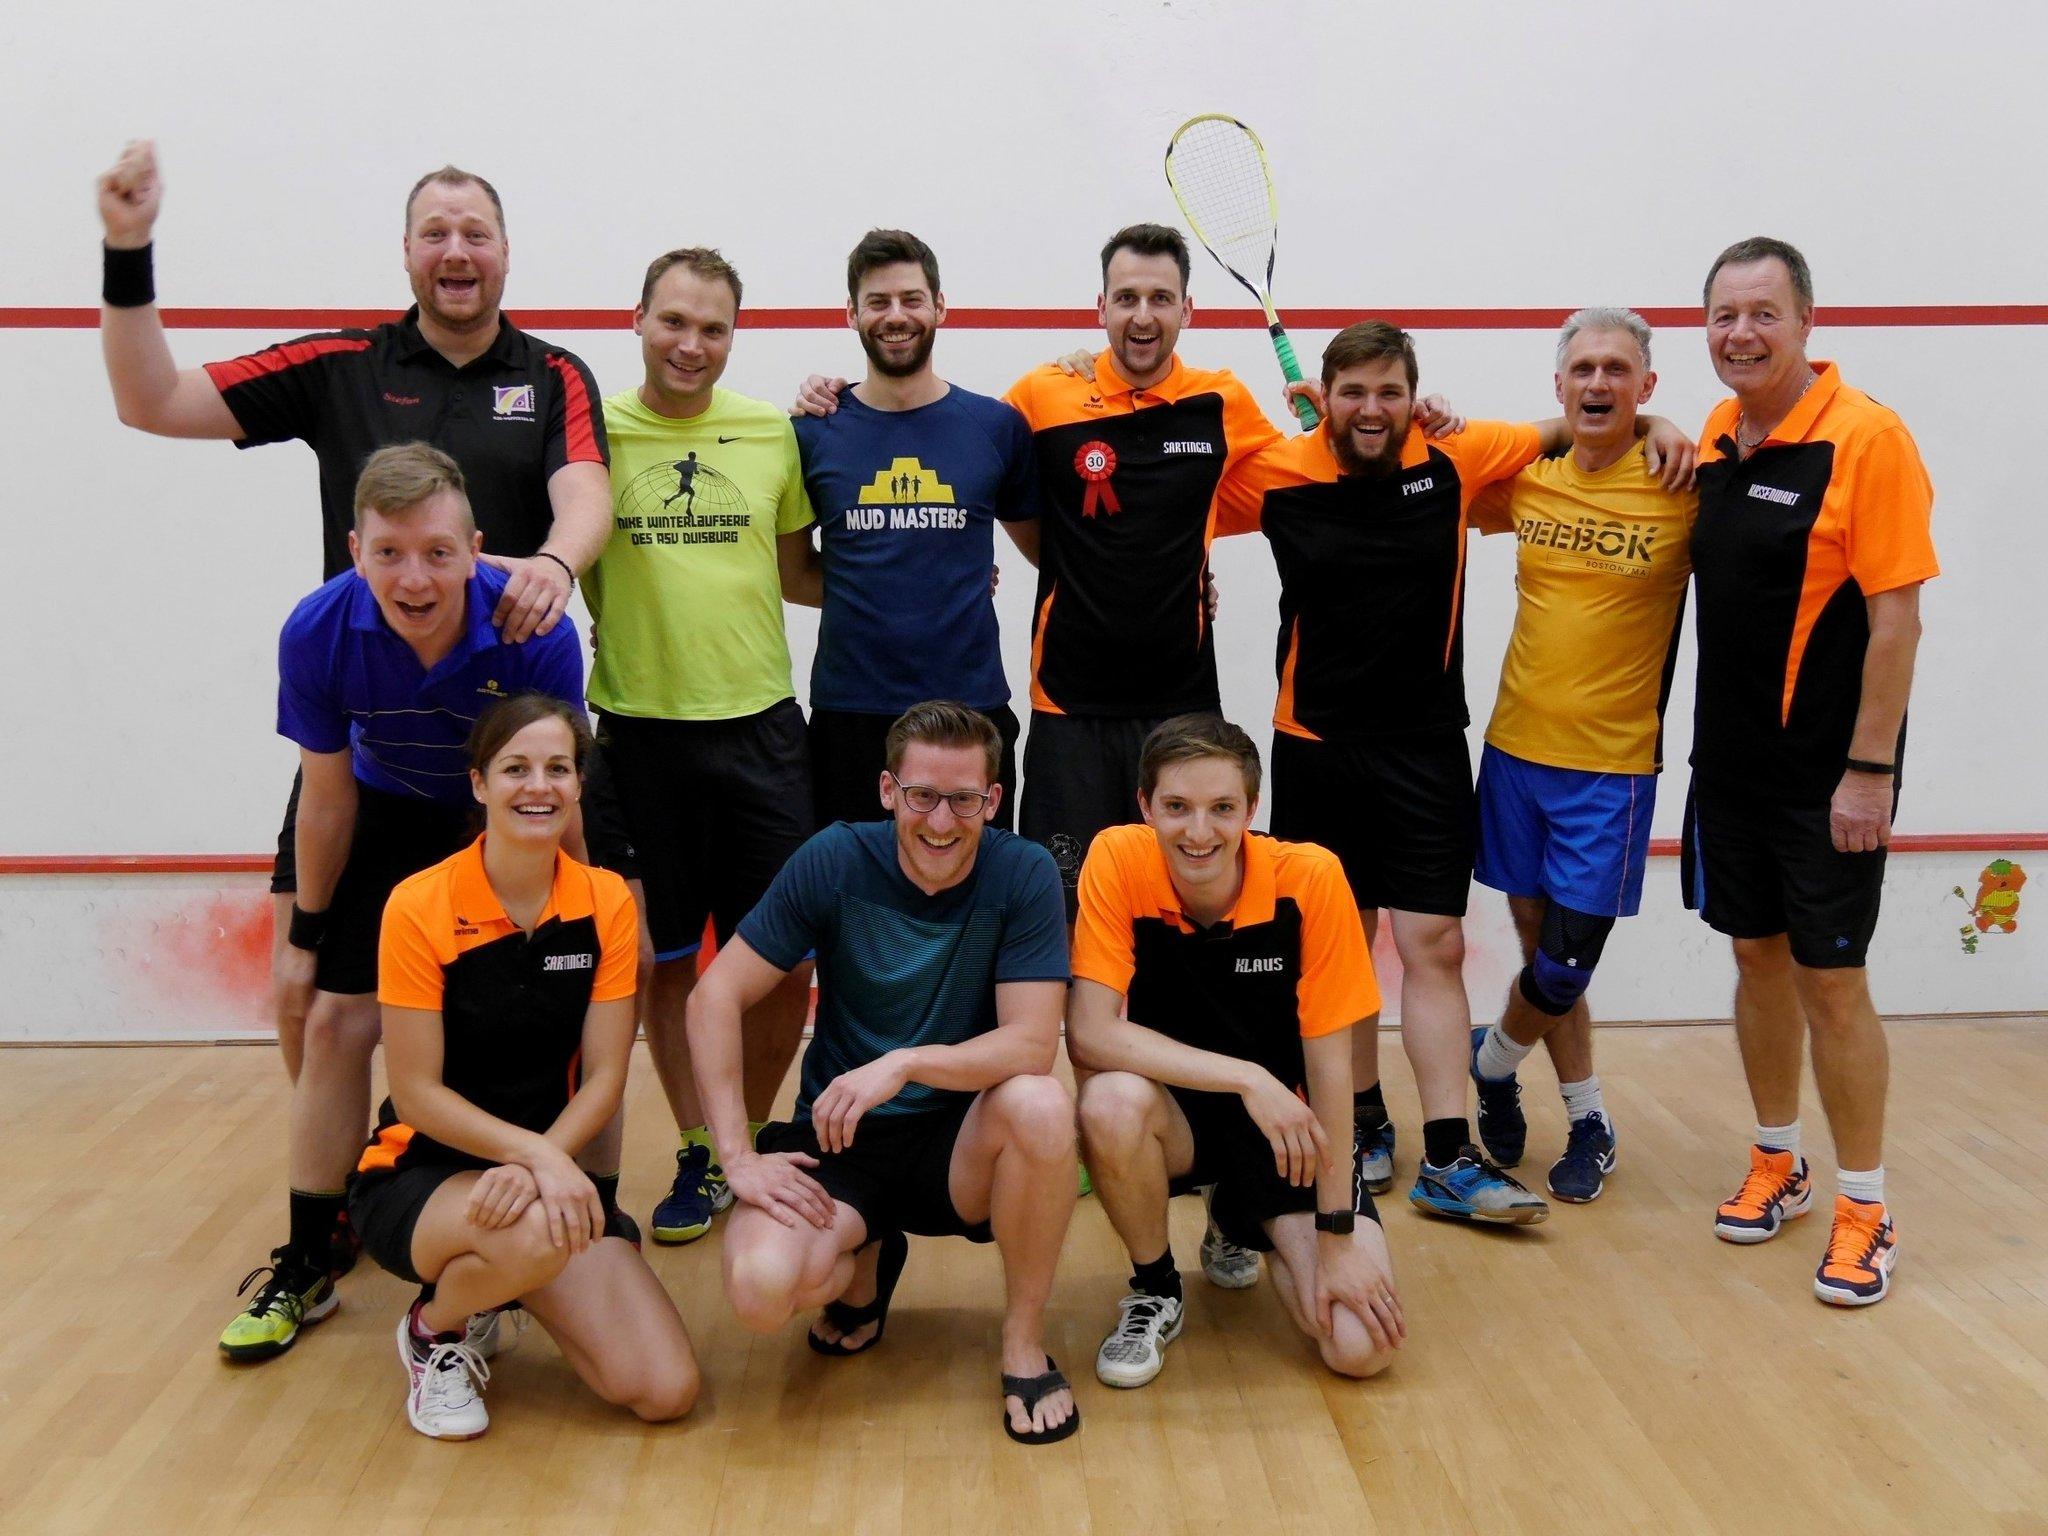 Badminton Verein Duisburg